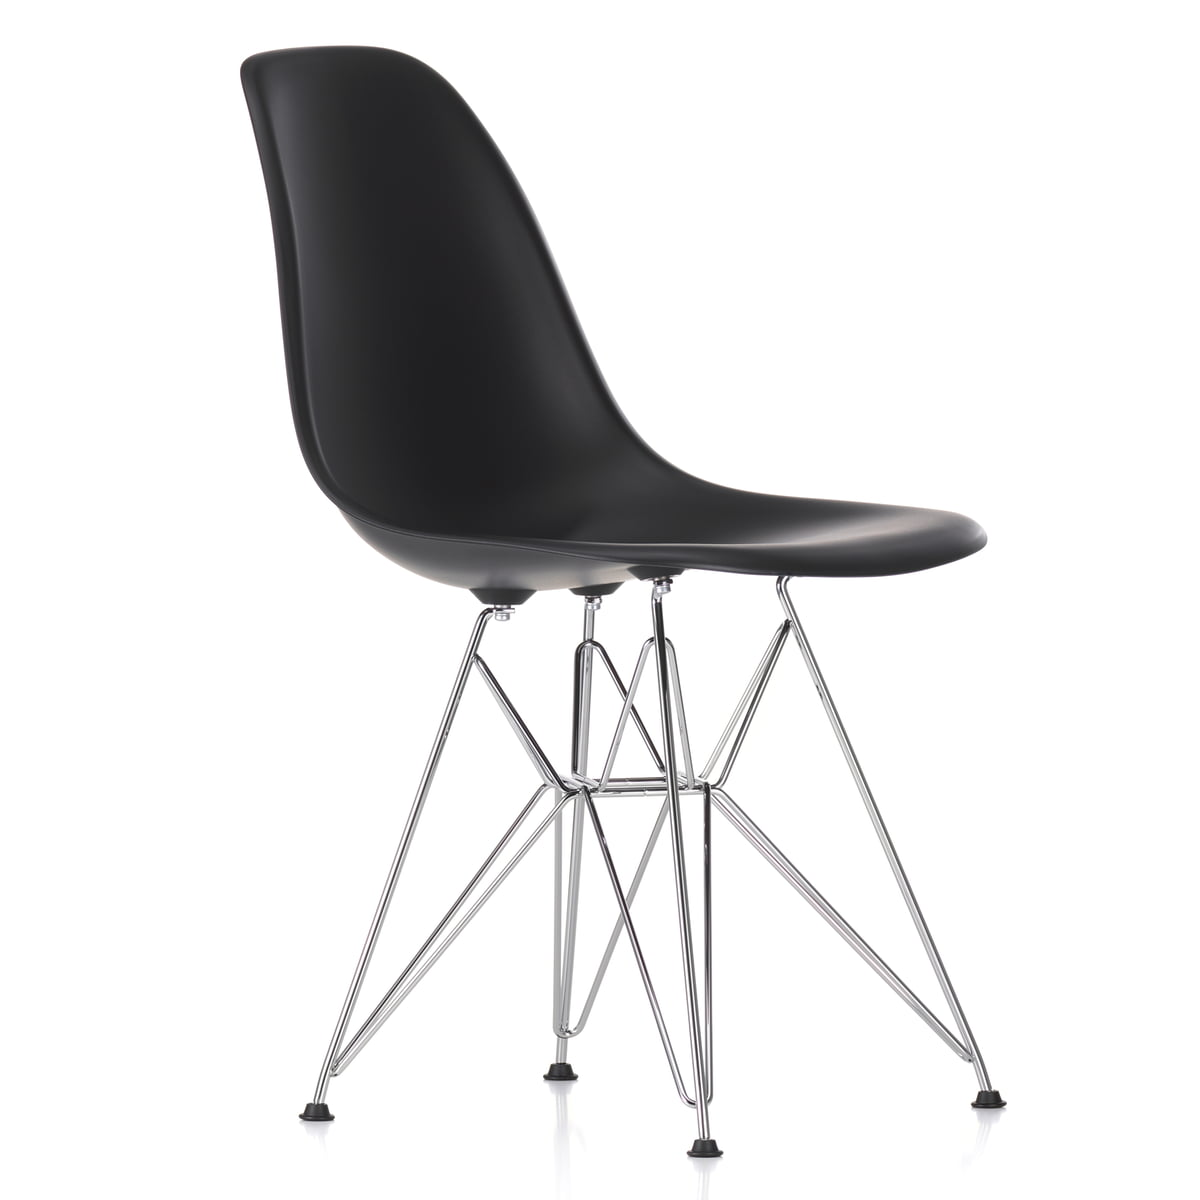 vitra dsr eames plastic side chair bei. Black Bedroom Furniture Sets. Home Design Ideas